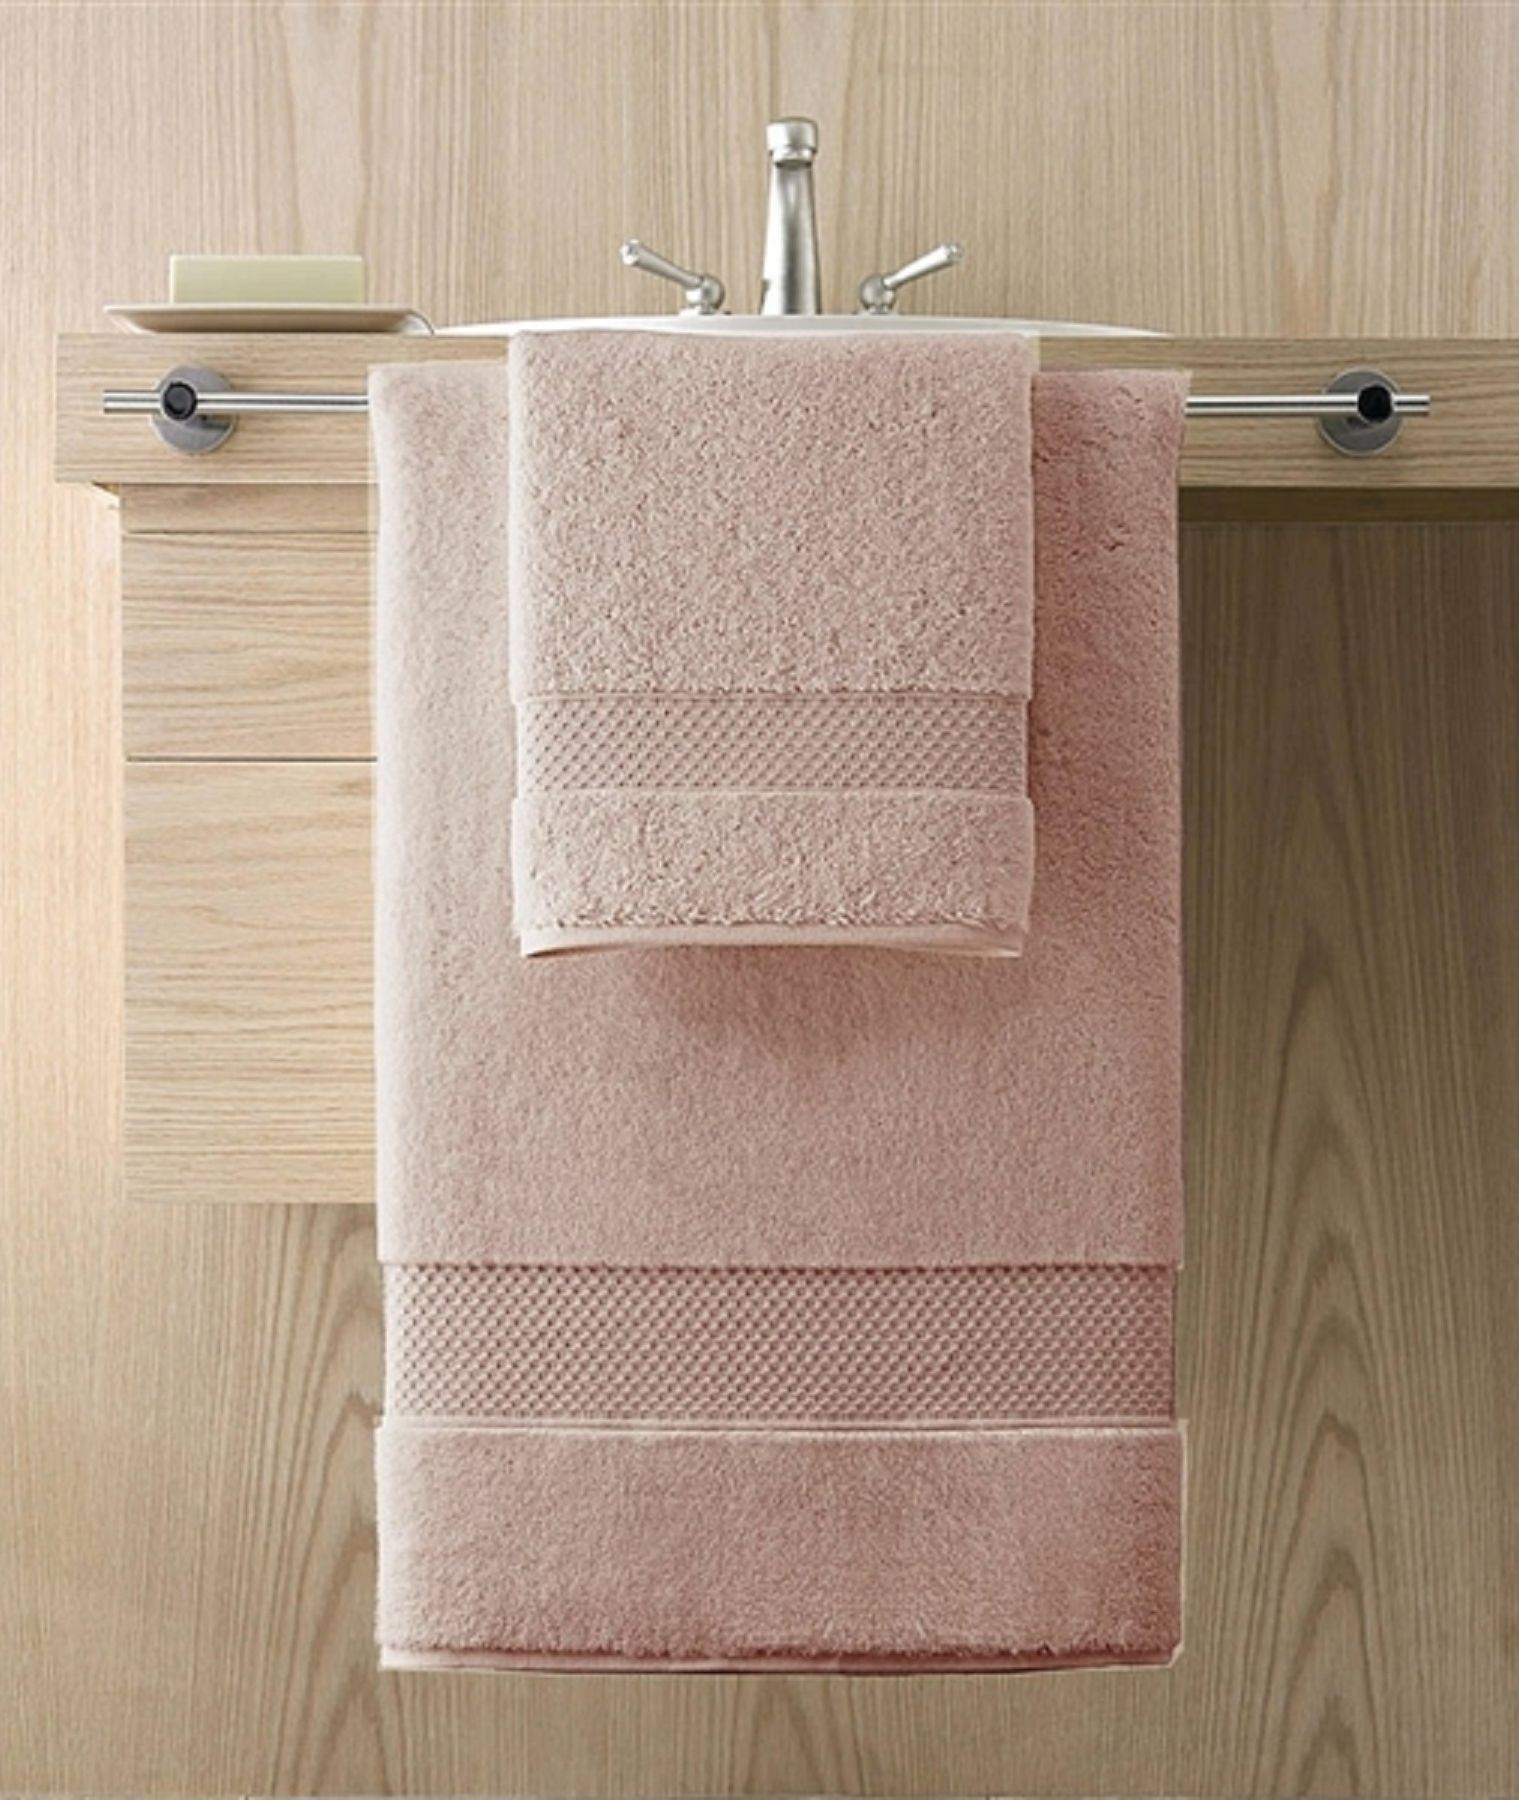 Коврики для ванной Элитный банный коврик Elegance Rosette от Kassatex elitnyy-bannyy-kovrik-elegance-rosette-ot-kassatex-portugaliya.jpg